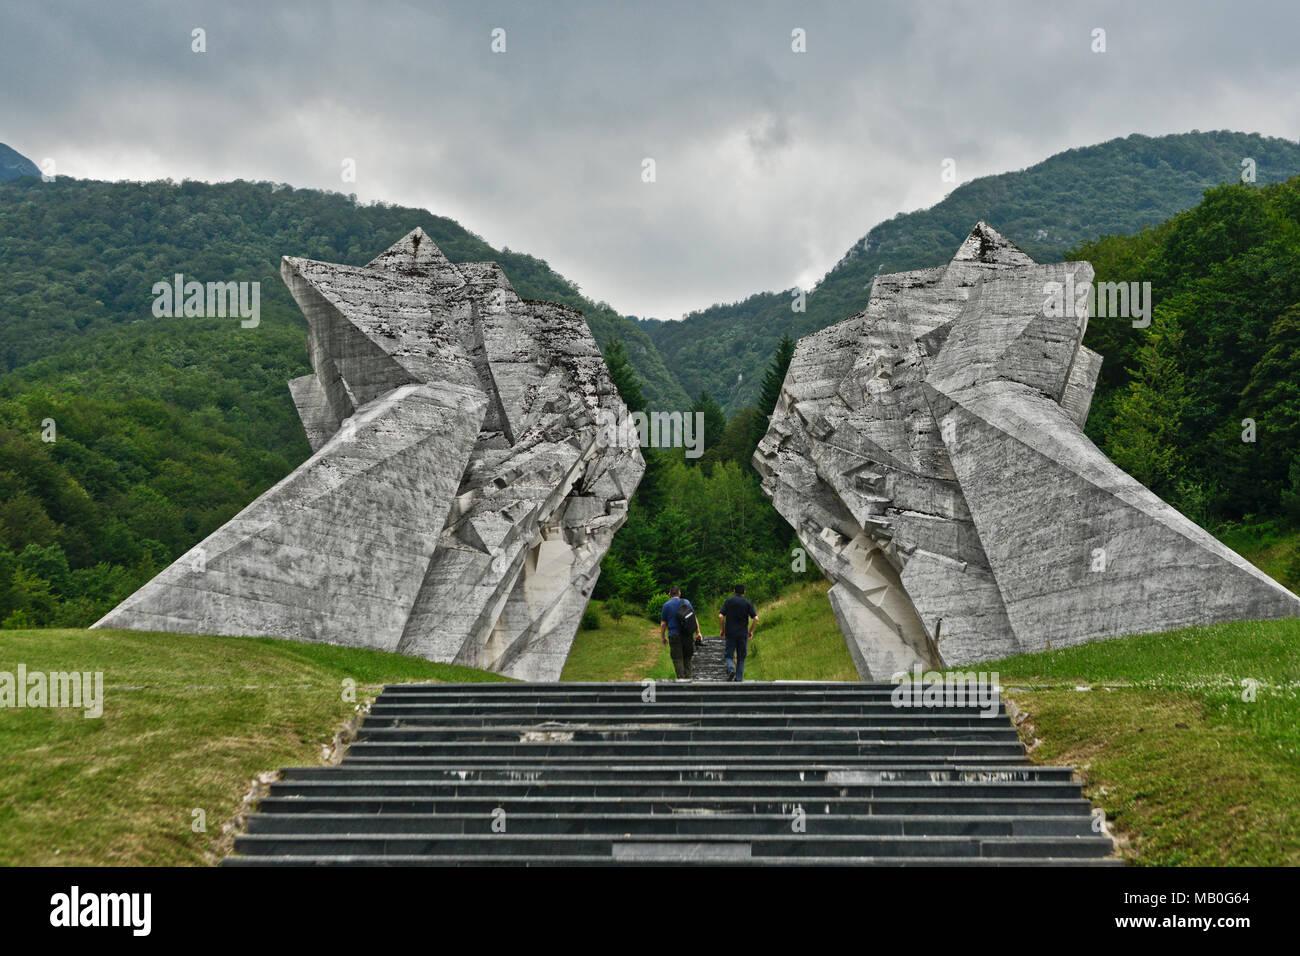 Tjentiste War Memorial, Sutjeska National Park, Bosnia and Herzegovina - Stock Image